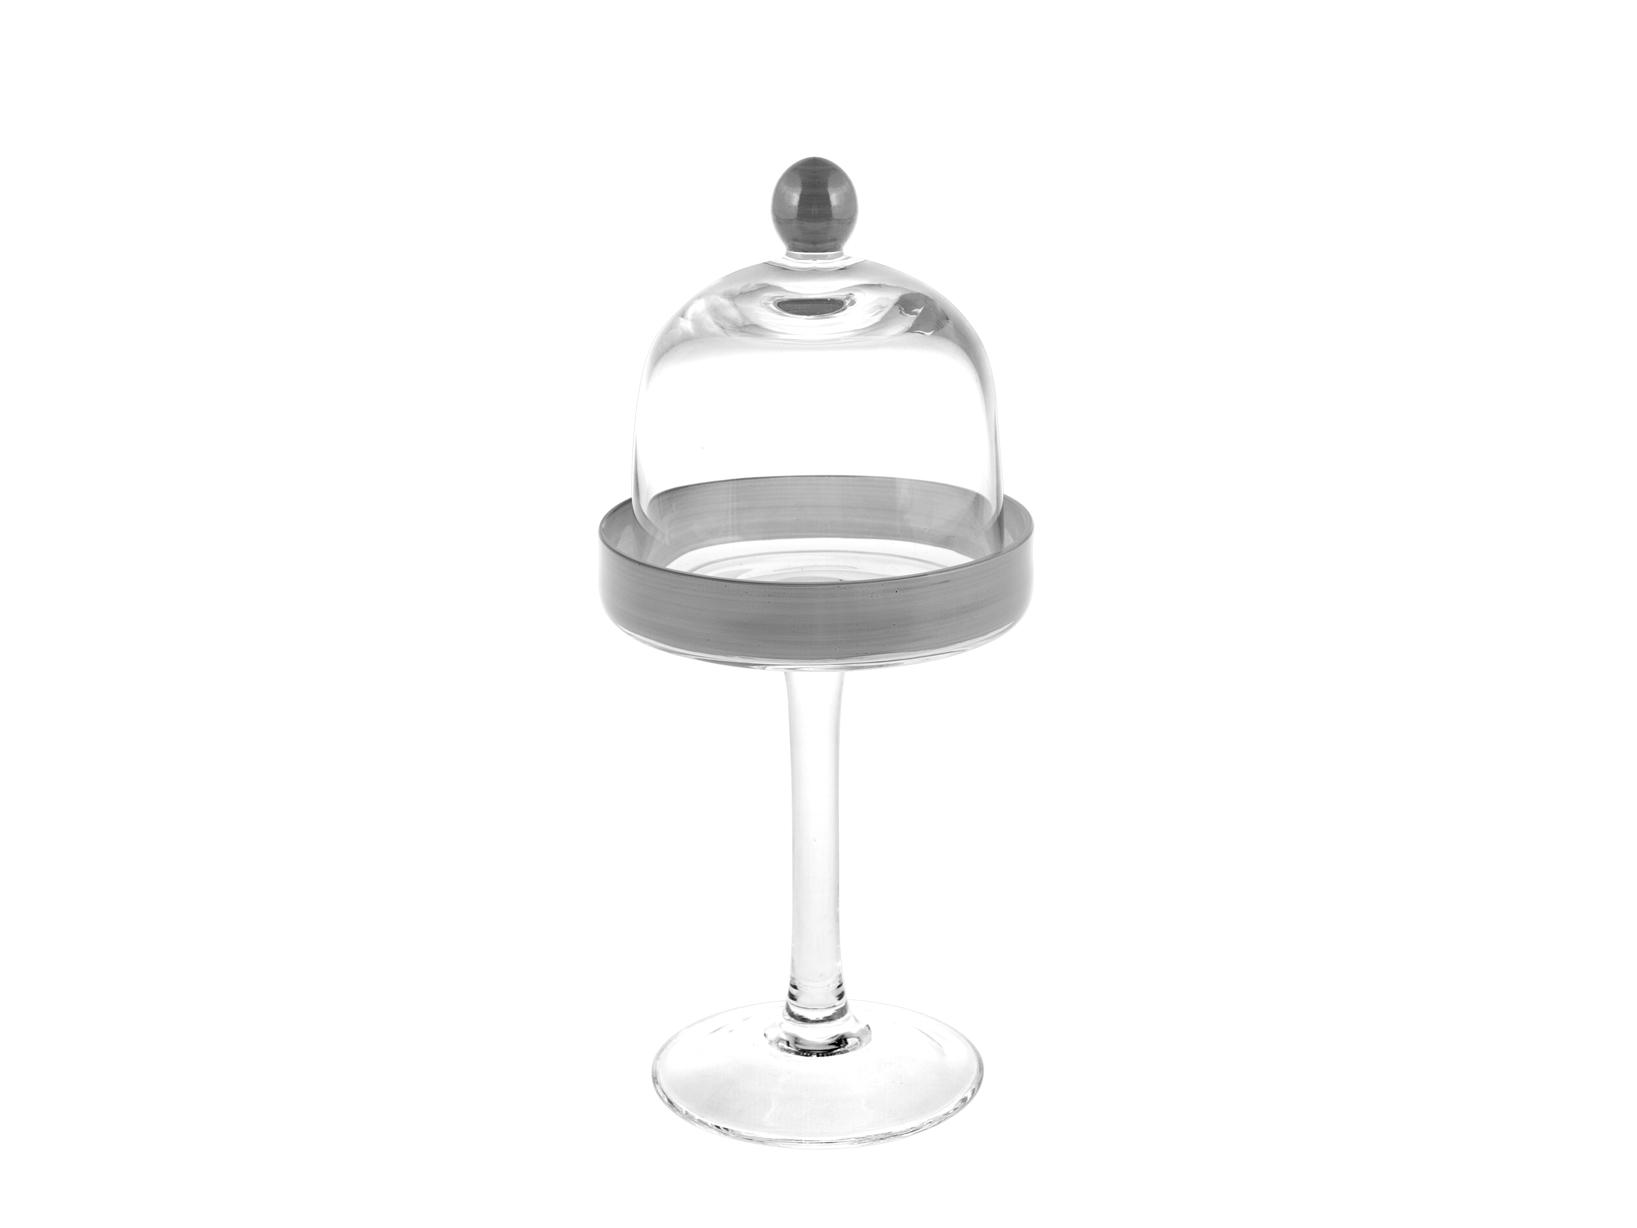 H&h Alzata Vetro Con Cupola Grey Cm12 H26